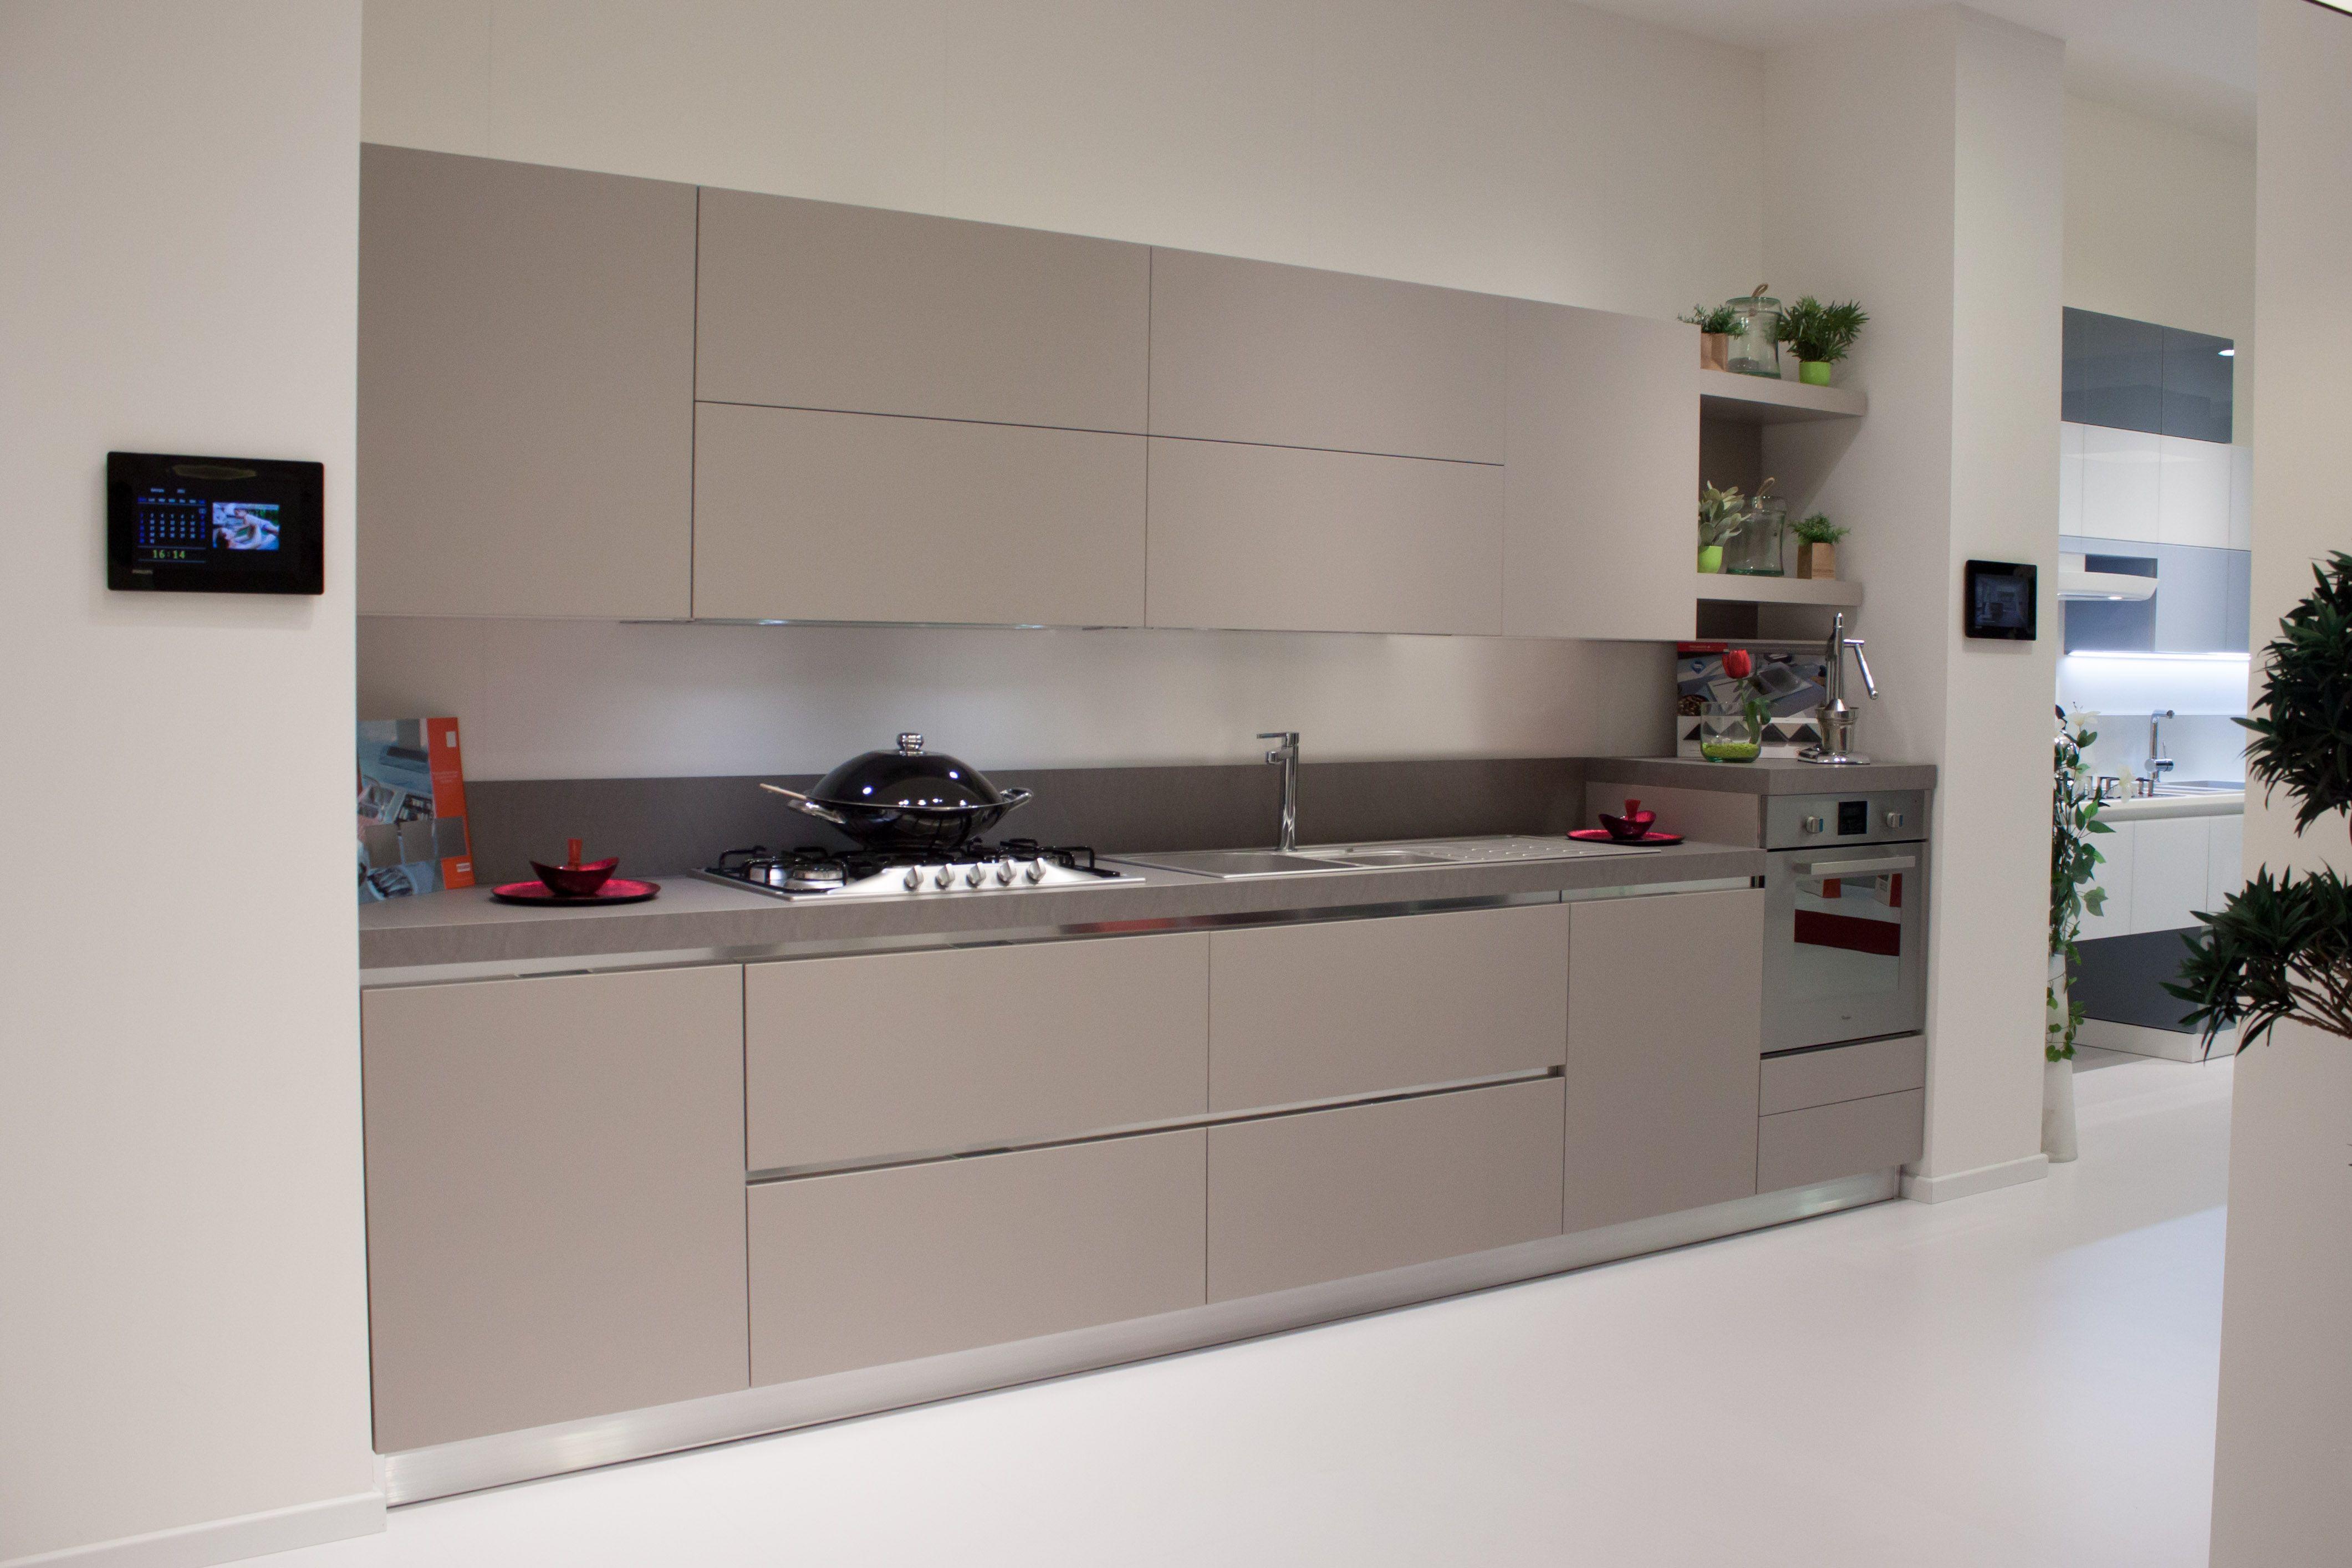 Best Immagini Cucine Moderne Scavolini Pictures  Home